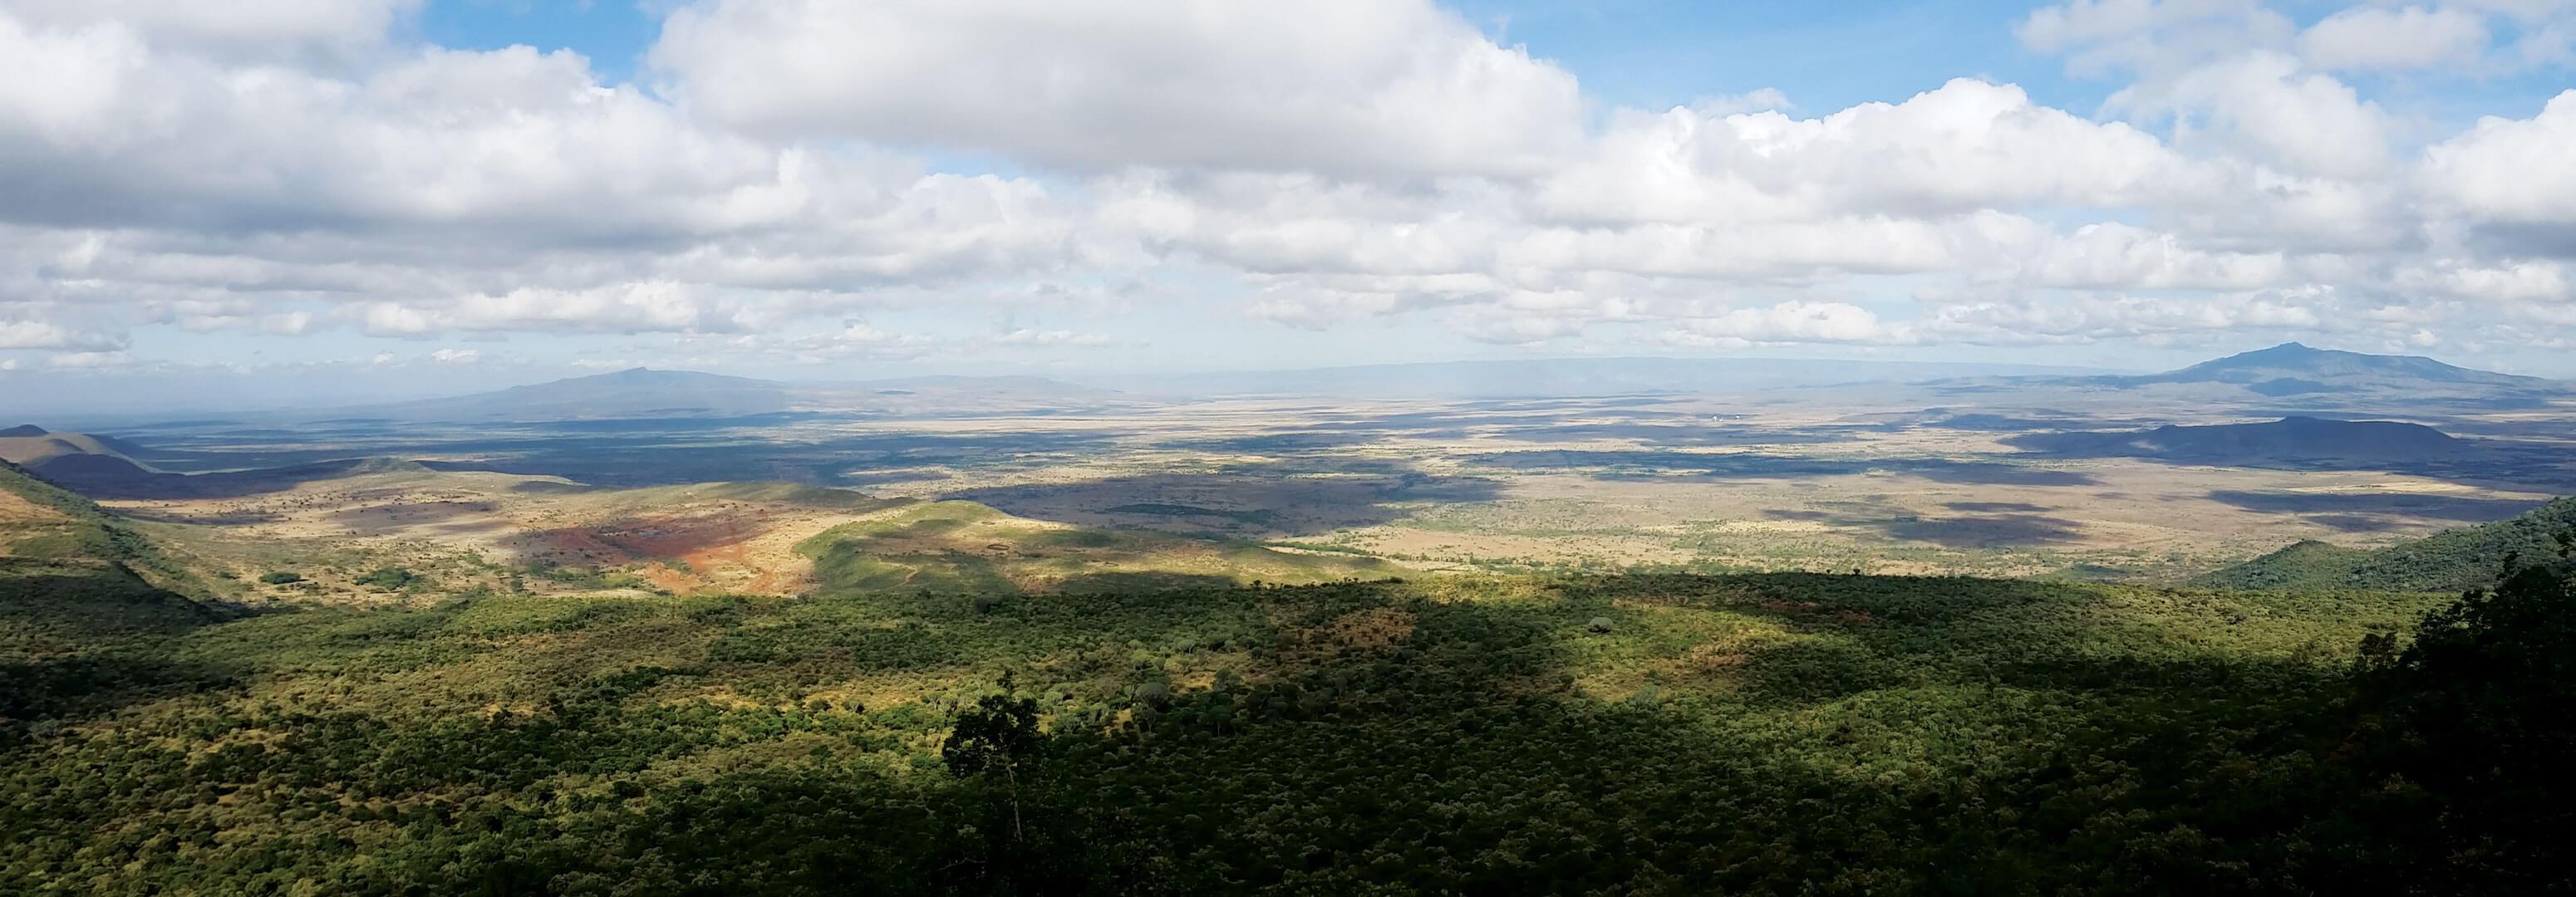 Photo of a landscape